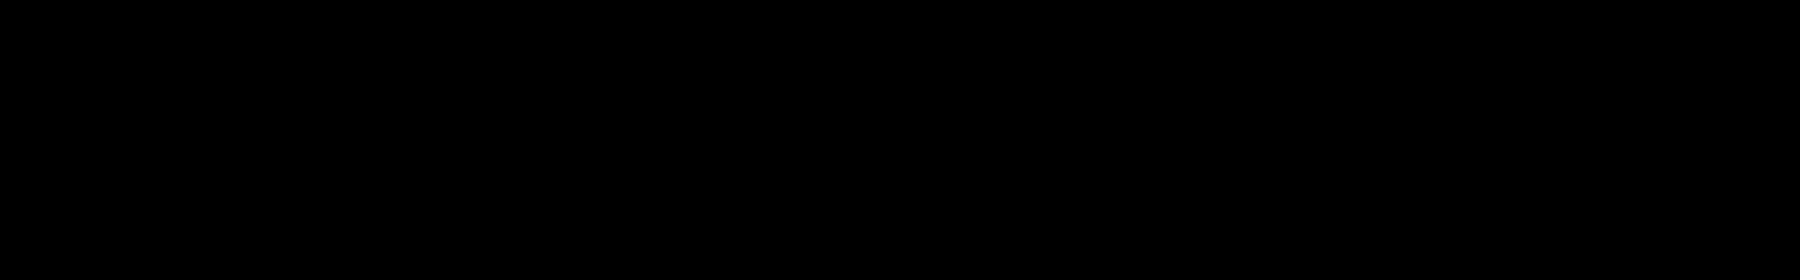 Alone - Rodriguez Jr. Style Ableton Template audio waveform